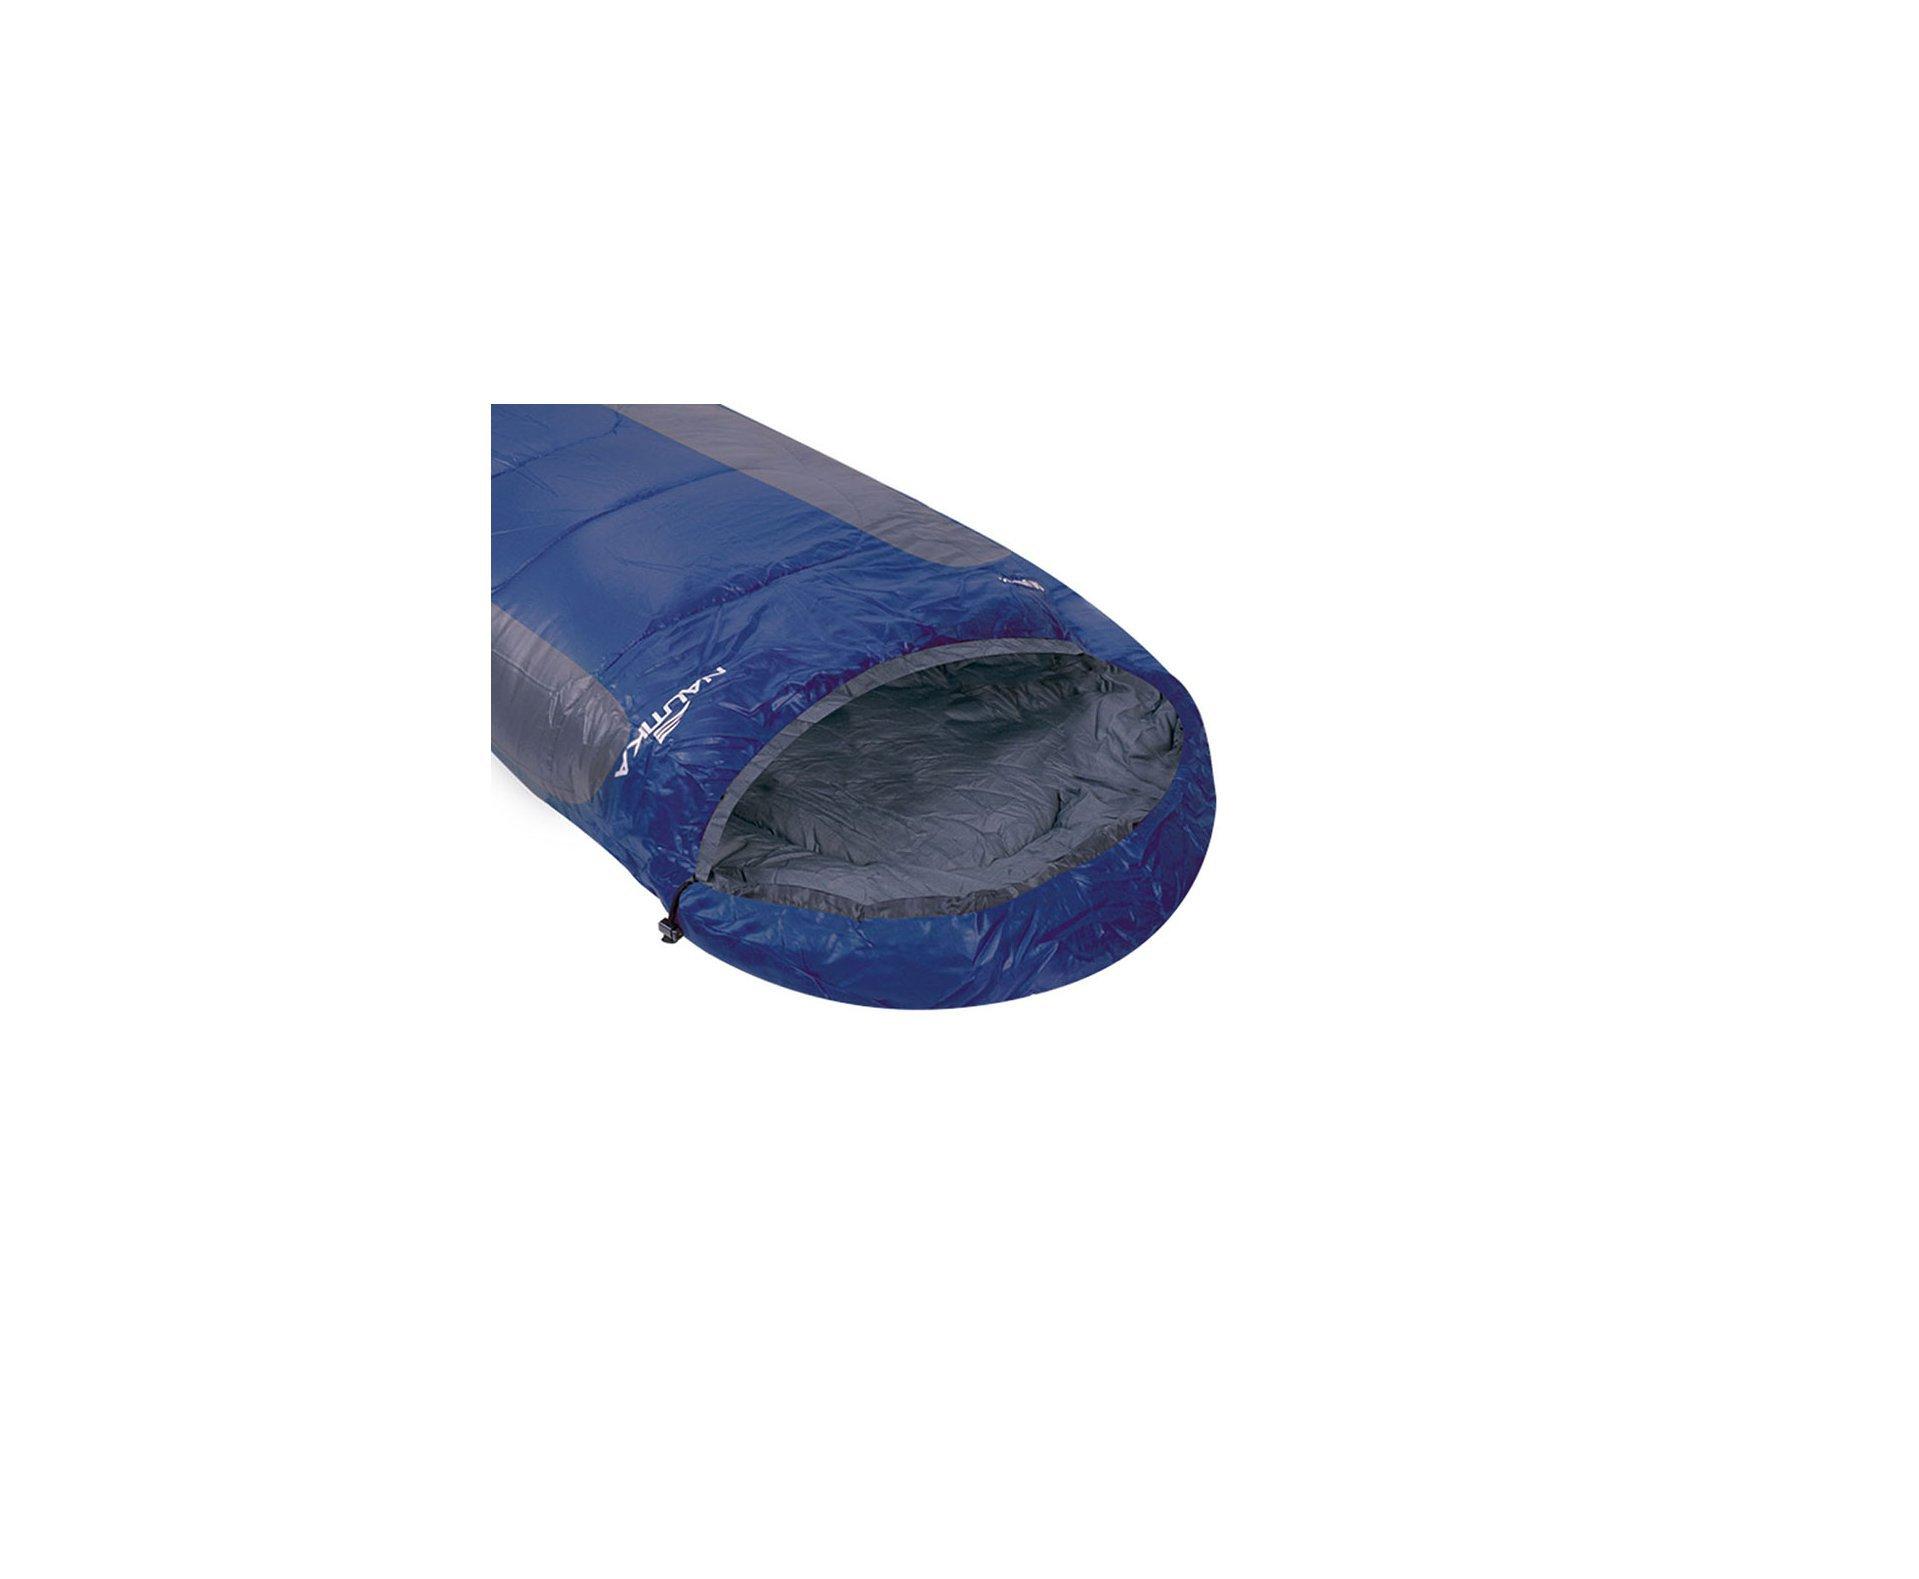 Saco De Dormir Mummy -1°c A +8°c Azul E Cinza - Nautika